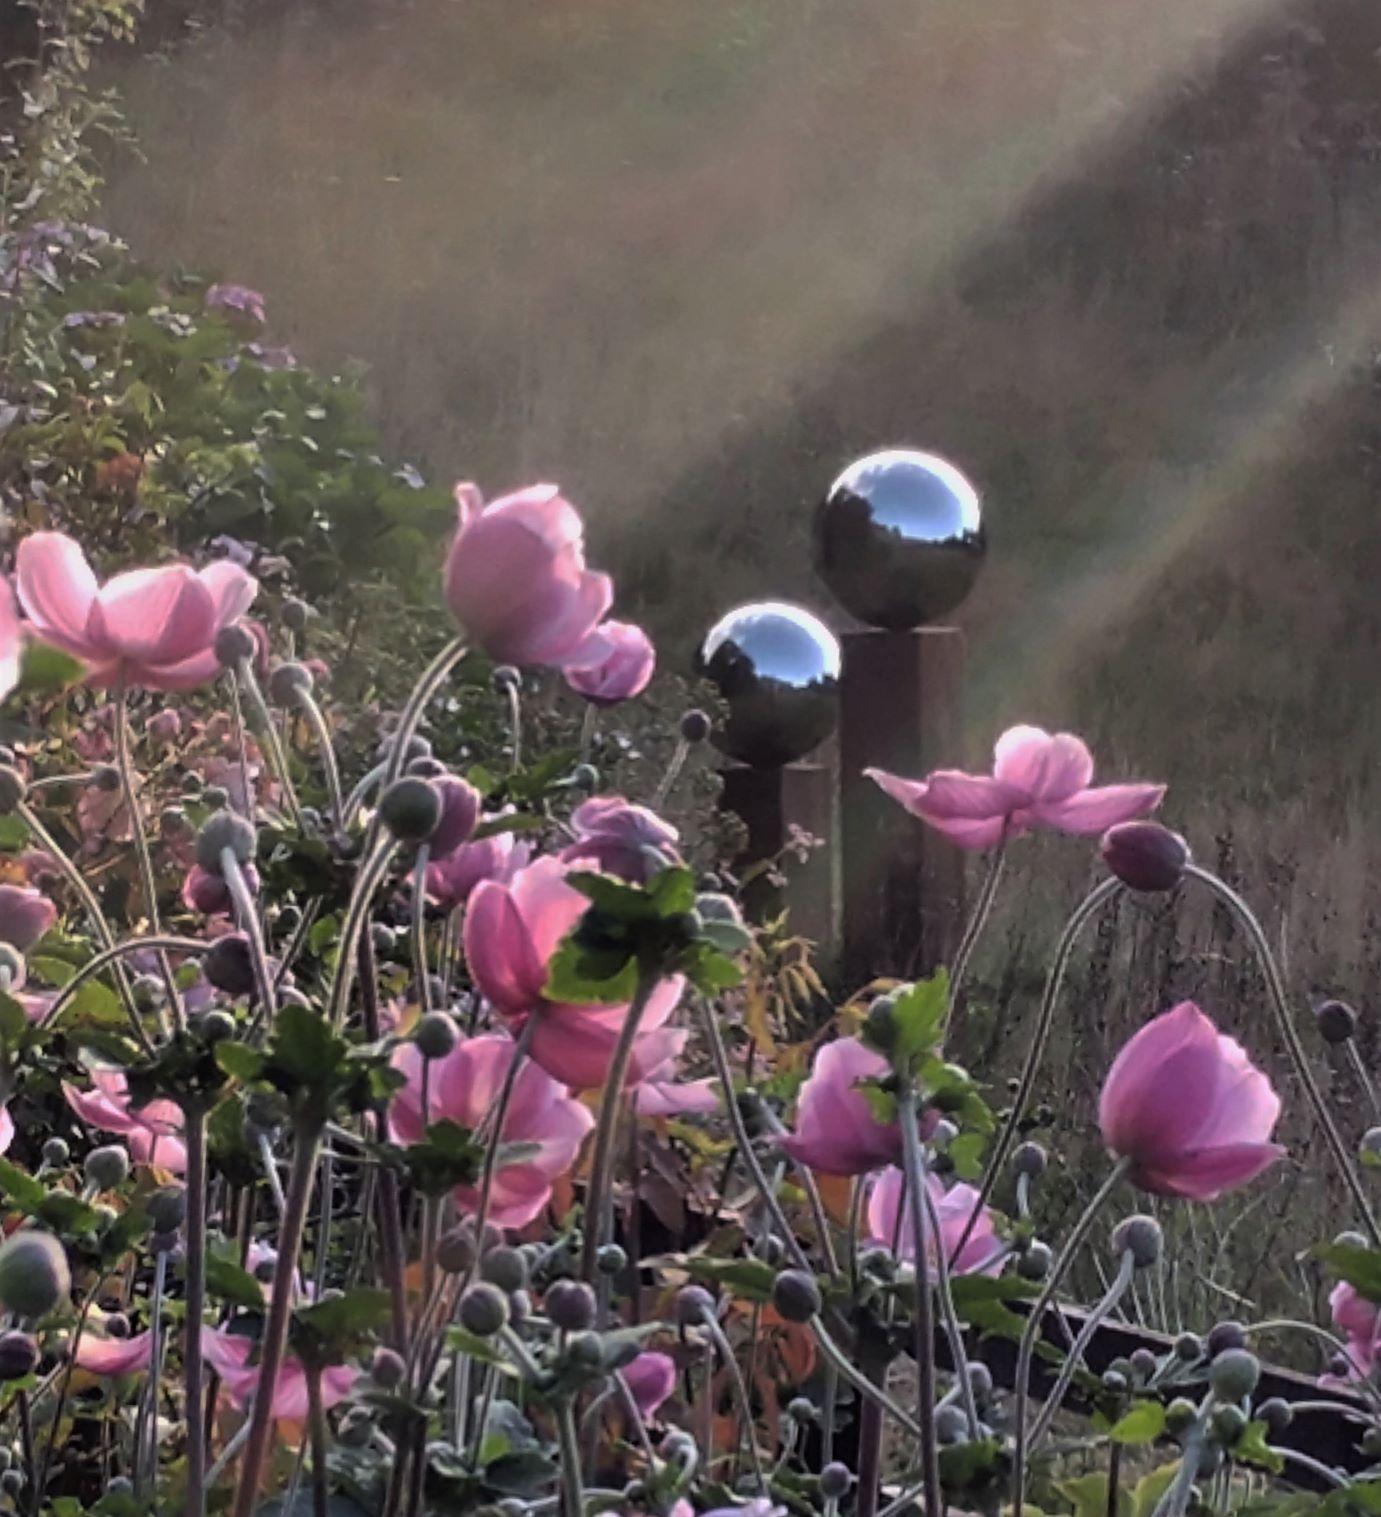 Japanese anemone at Veddw copyright Anne Wareham